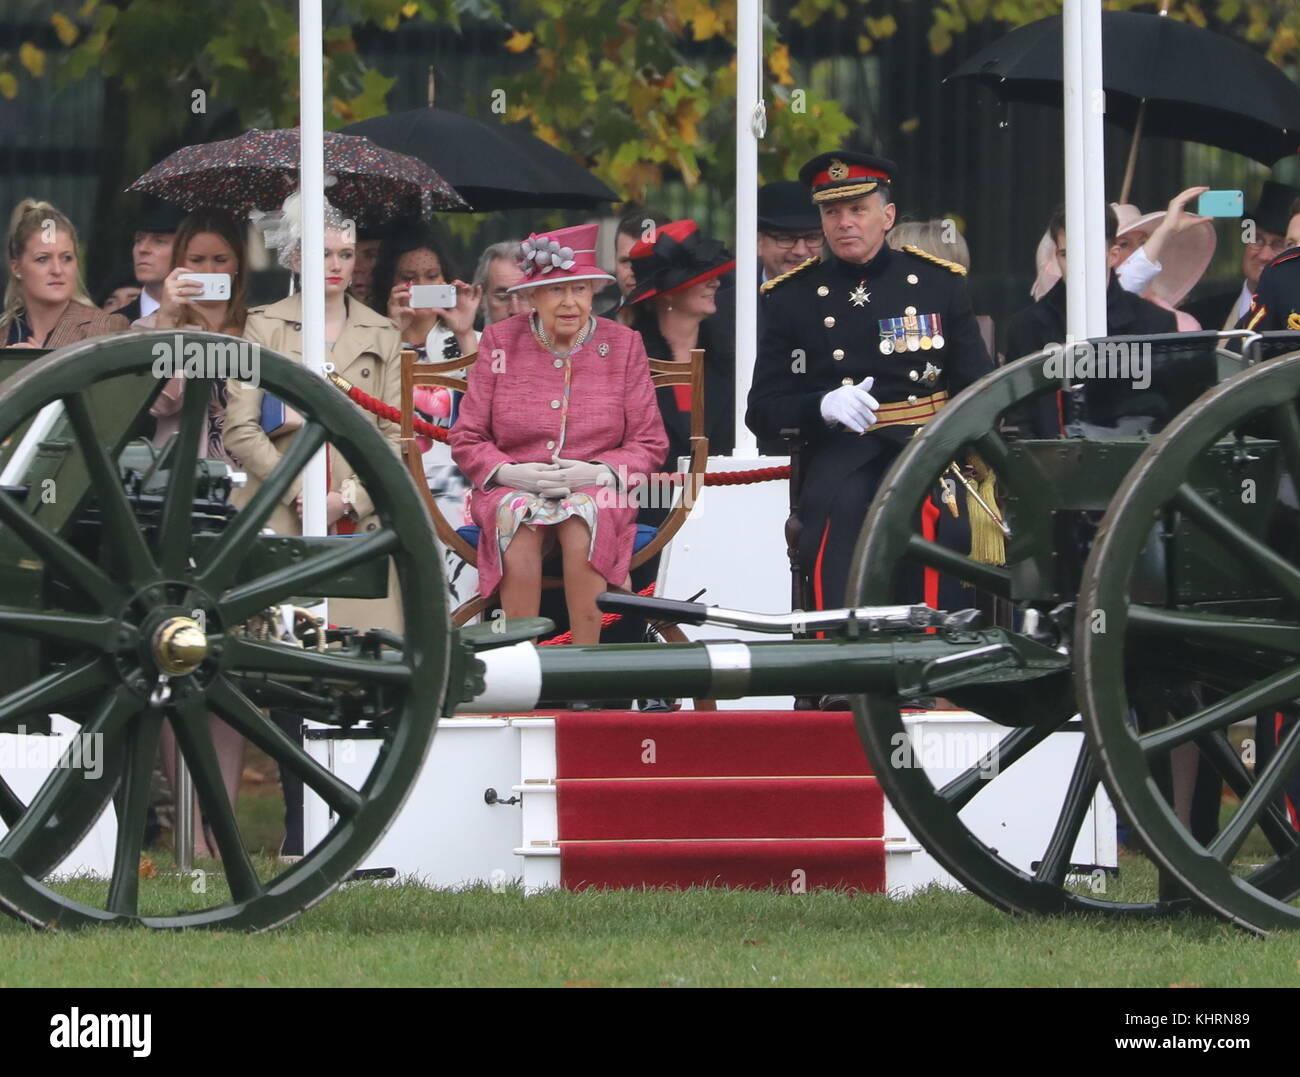 Armée britannique datant